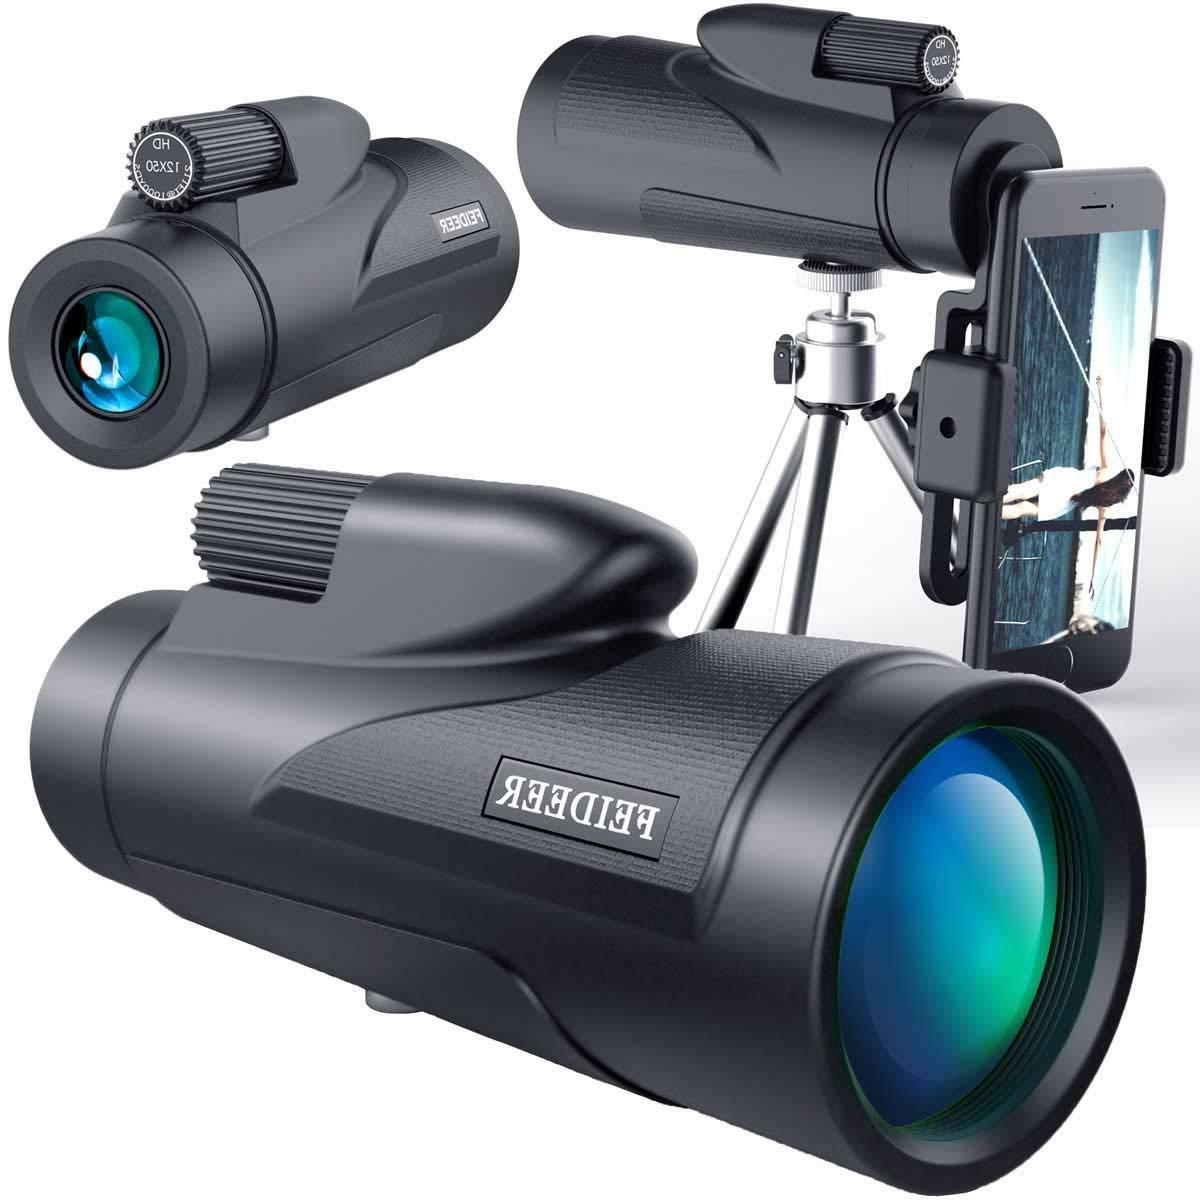 12x50 high power monocular binocular telescope spotting